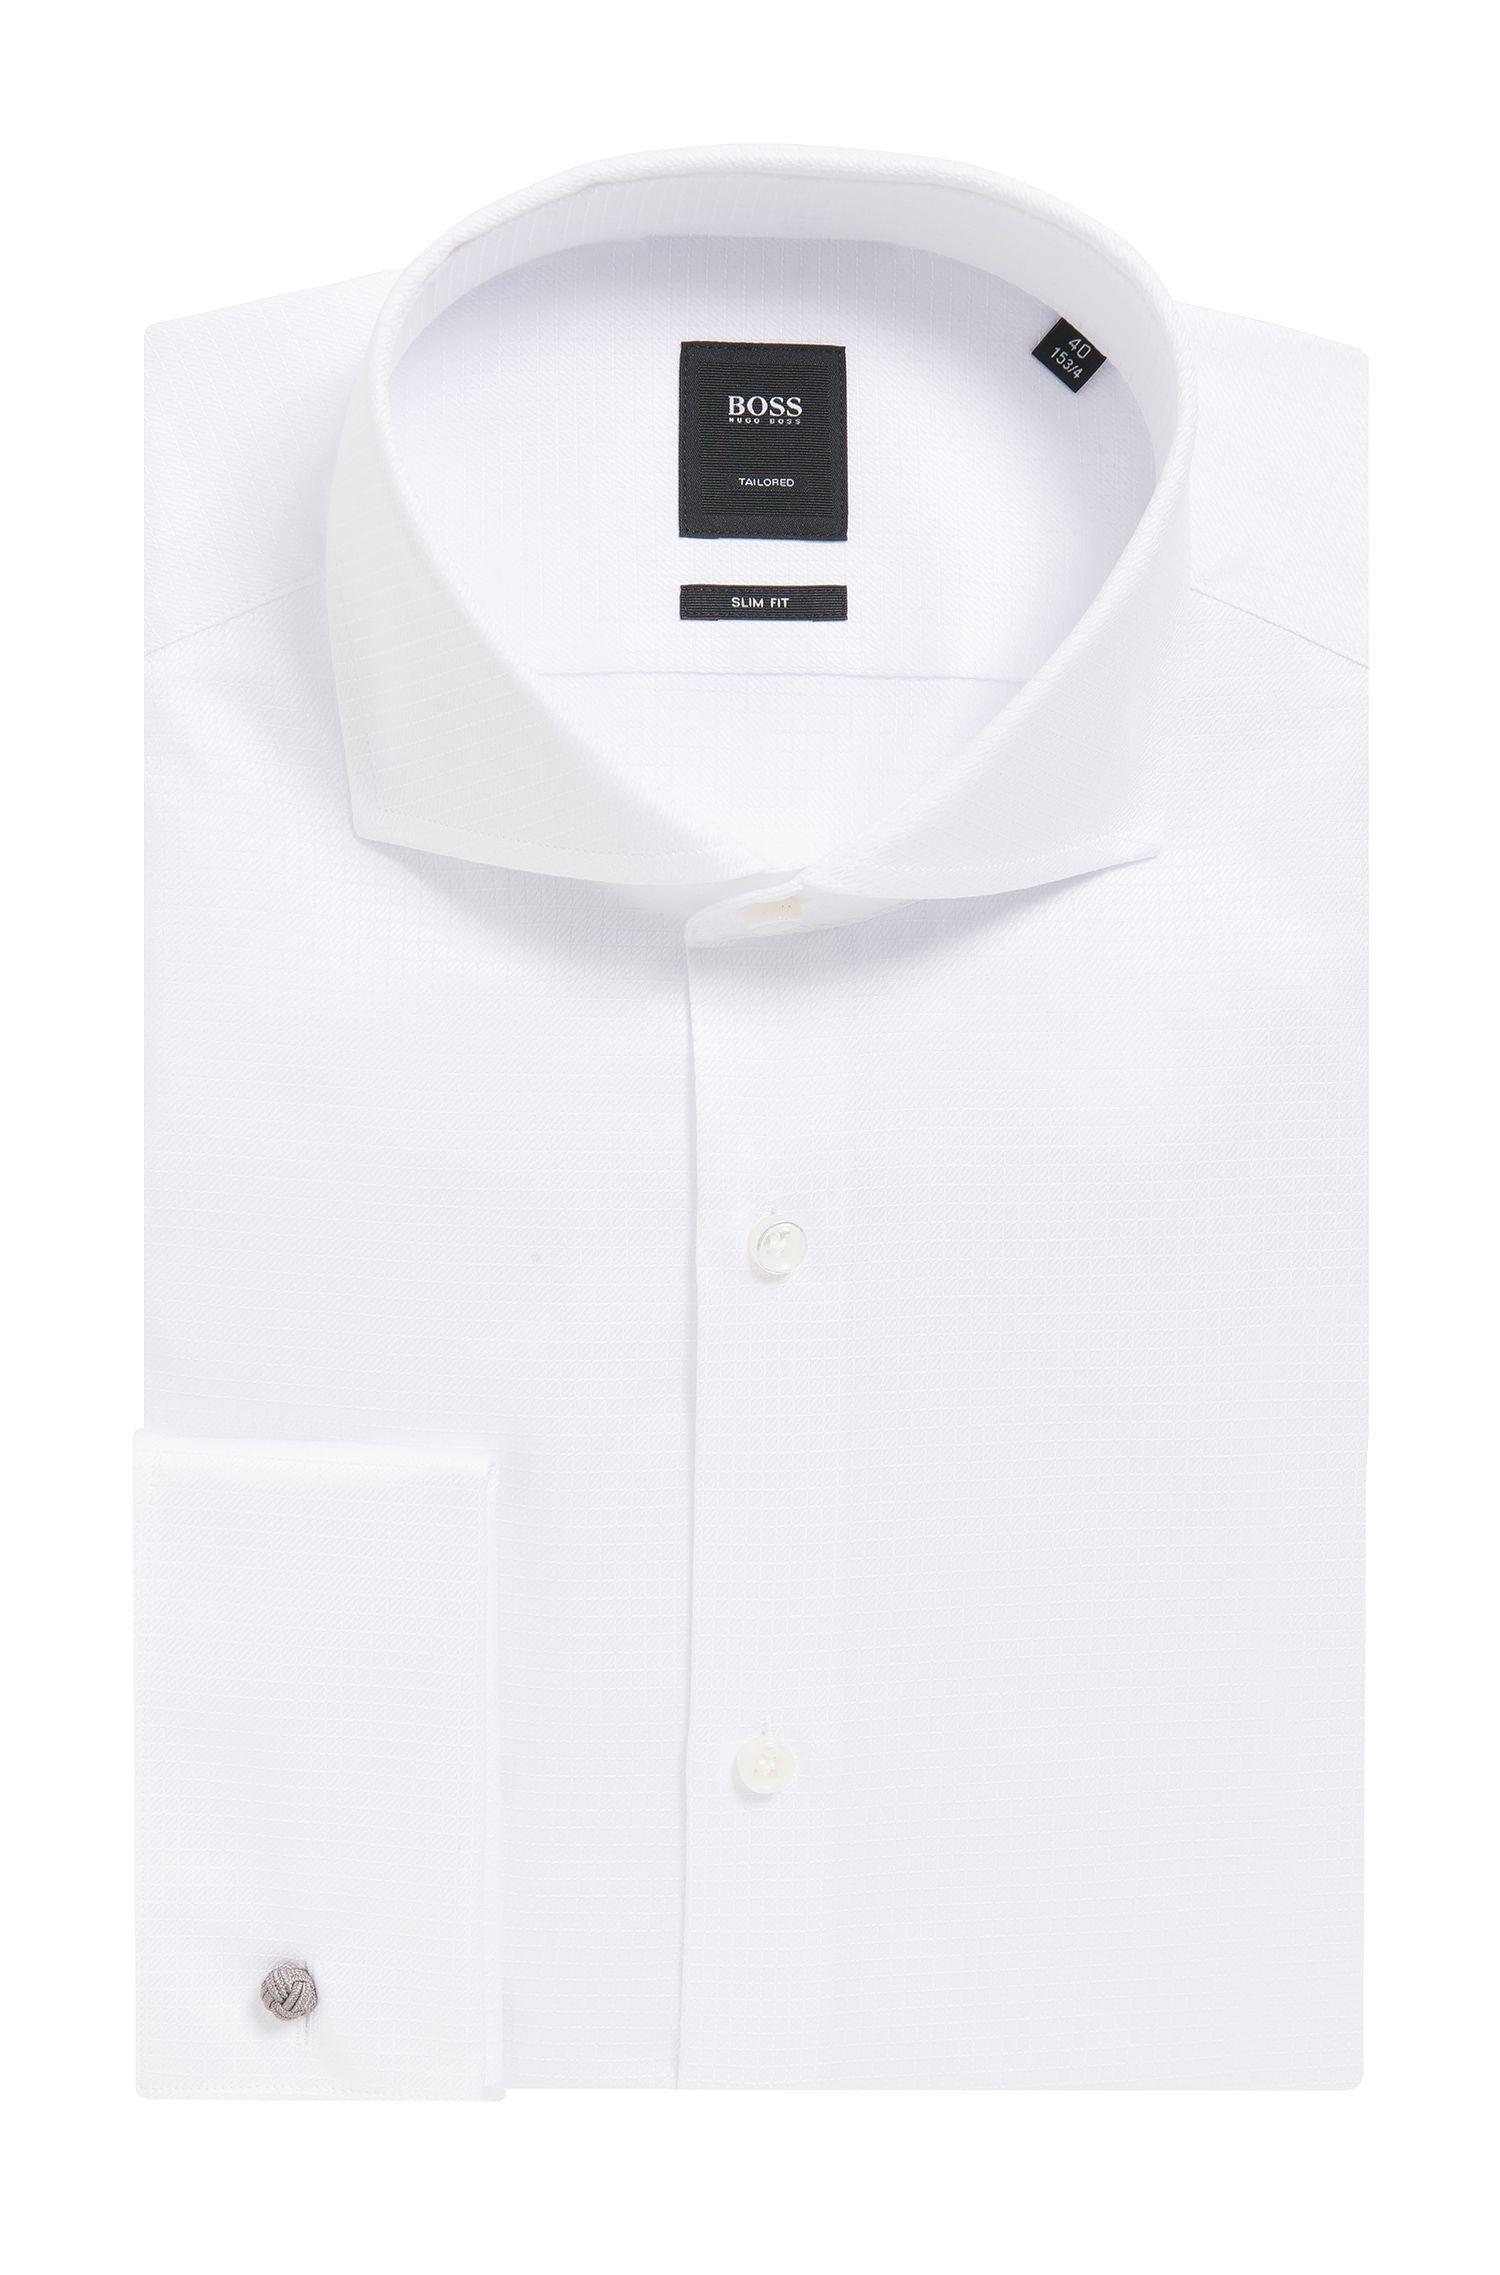 'T-Yacob' | Slim Fit, Tonal Check Cotton Dress Shirt